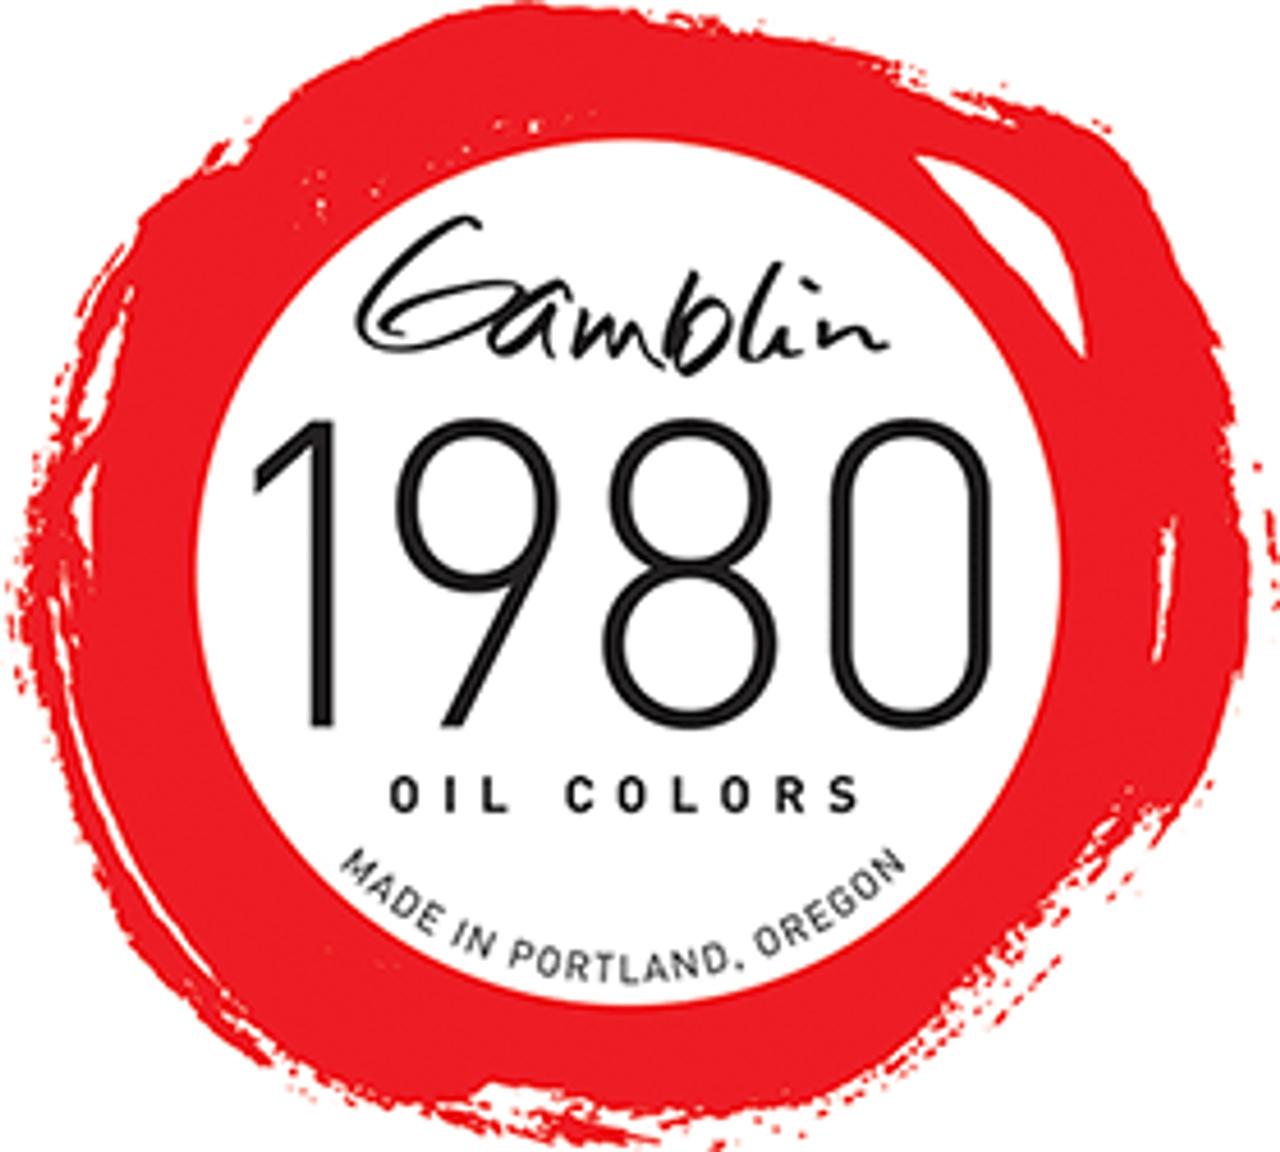 Gamblin 1980 Logo